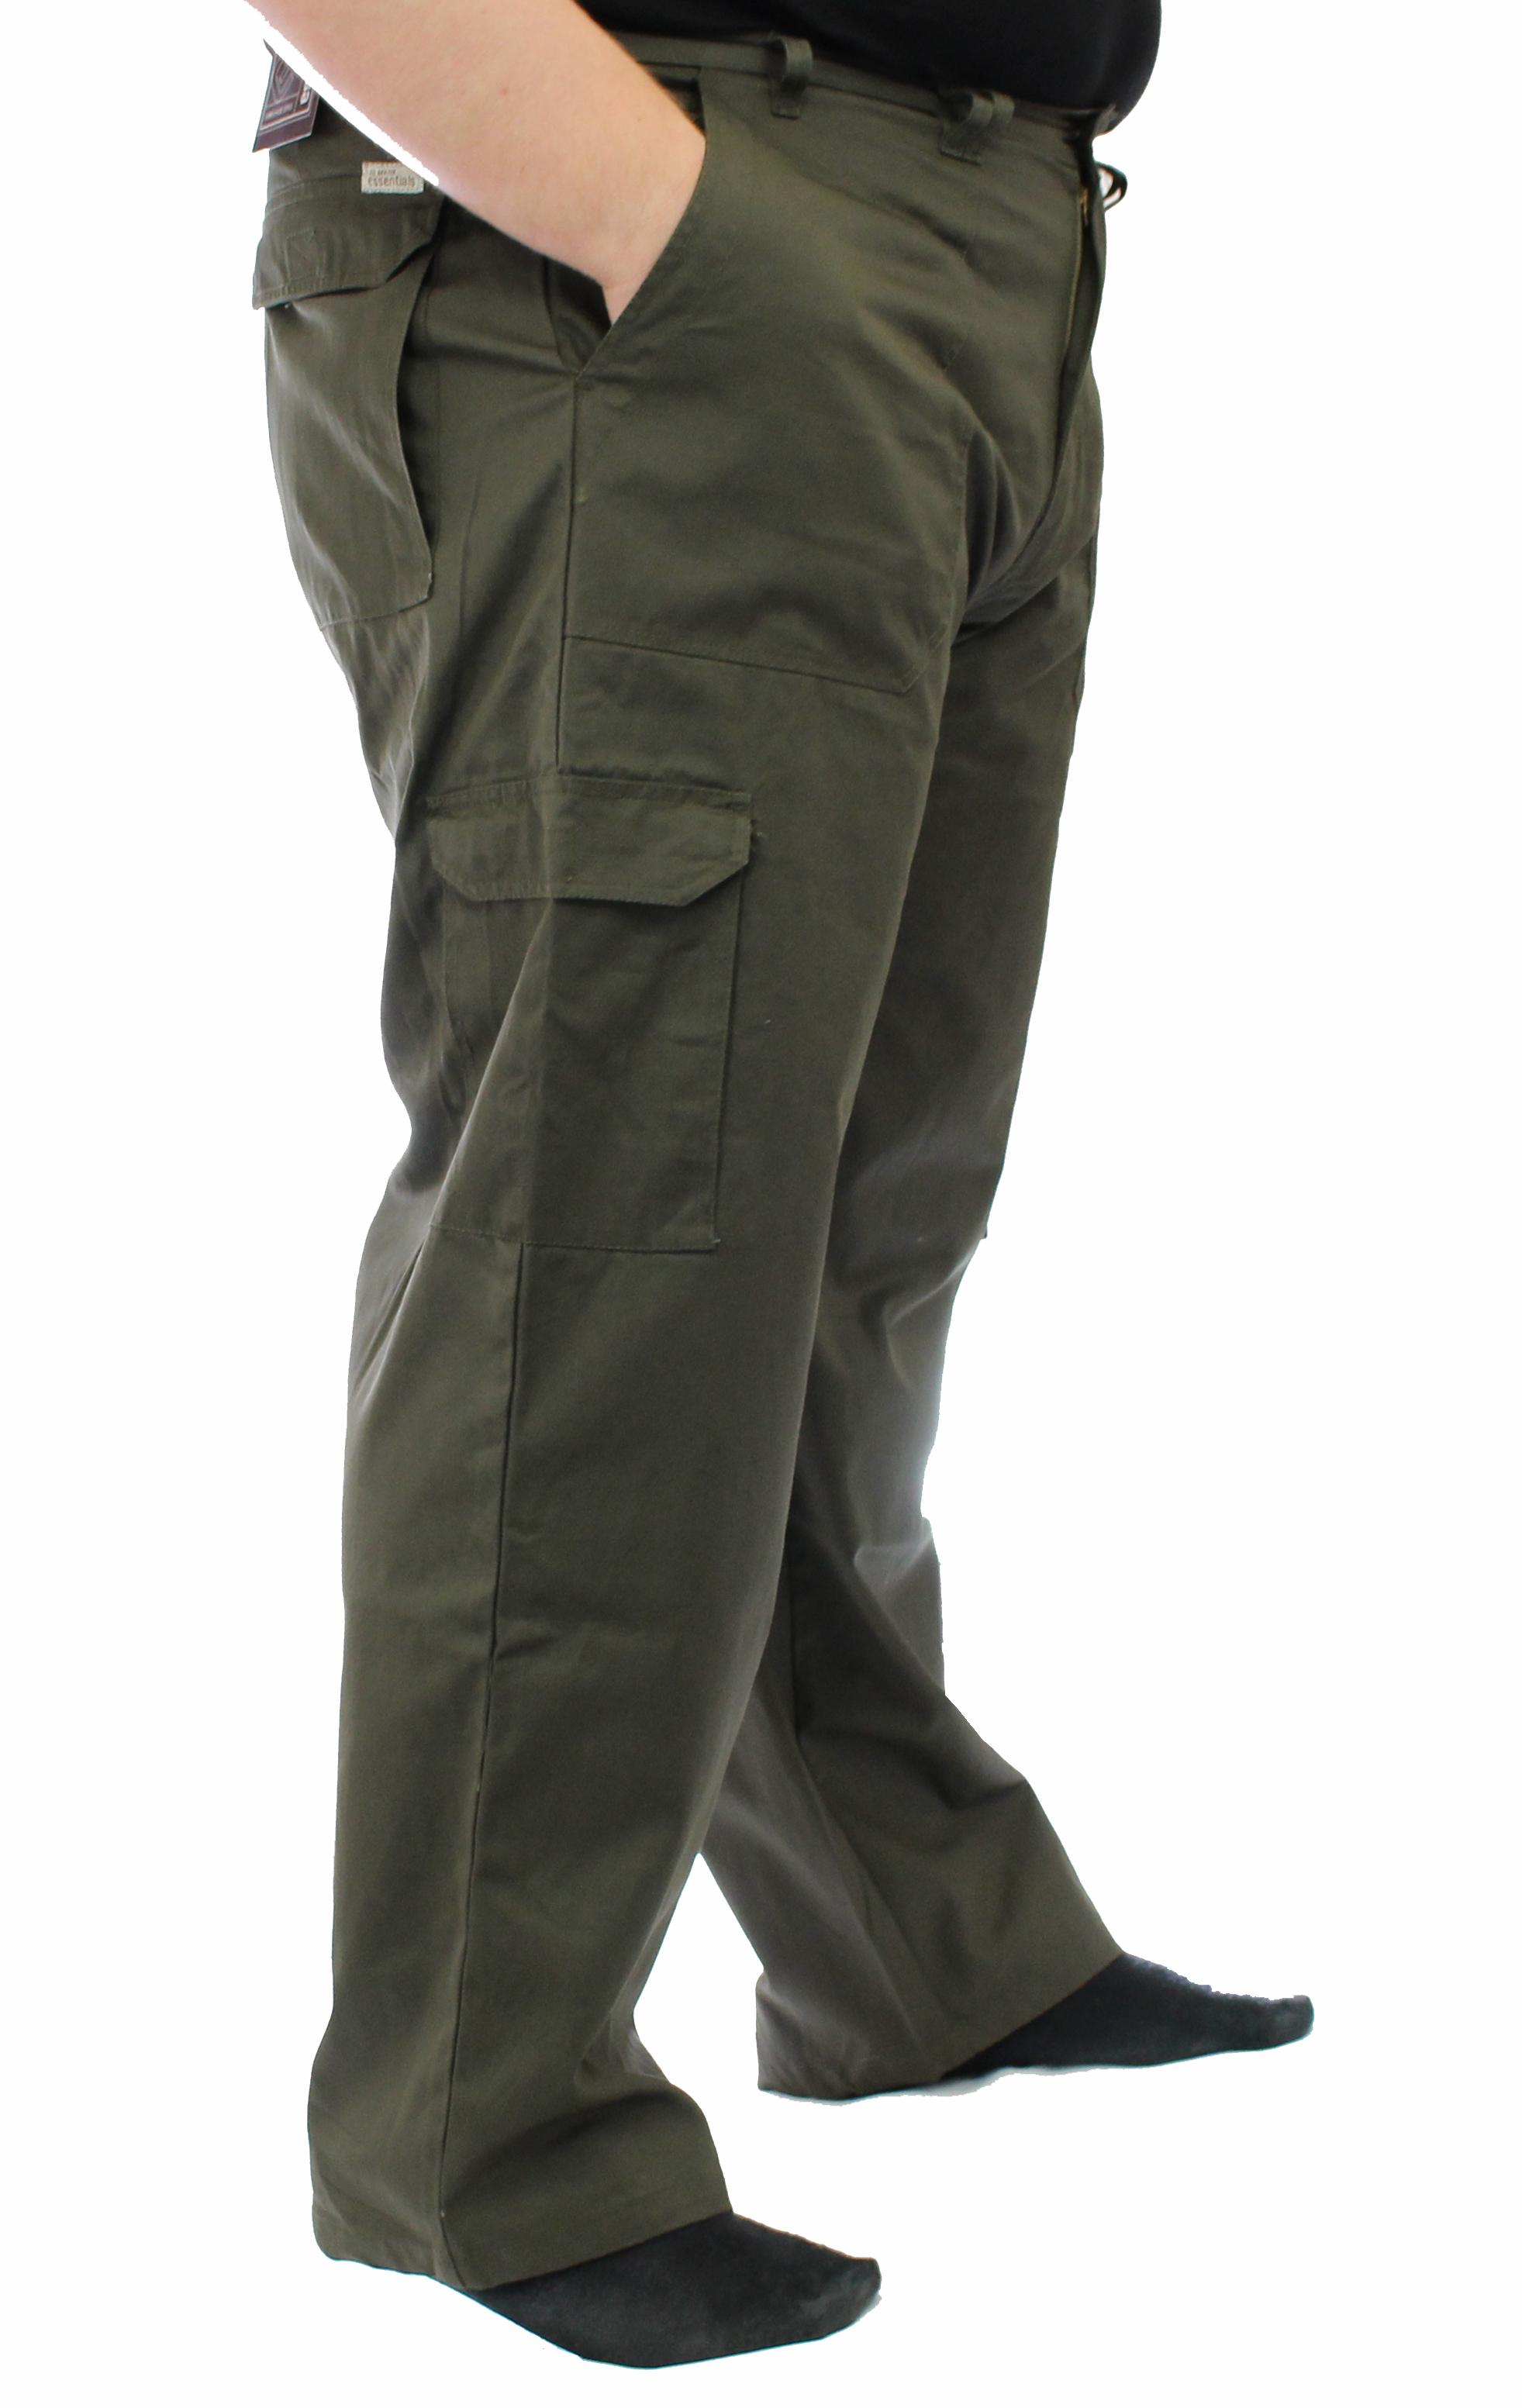 "Ed Baxter Victory - Heavy Duty Cargo Combat Trousers - Khaki - 60"" Waist, 30"" Leg"